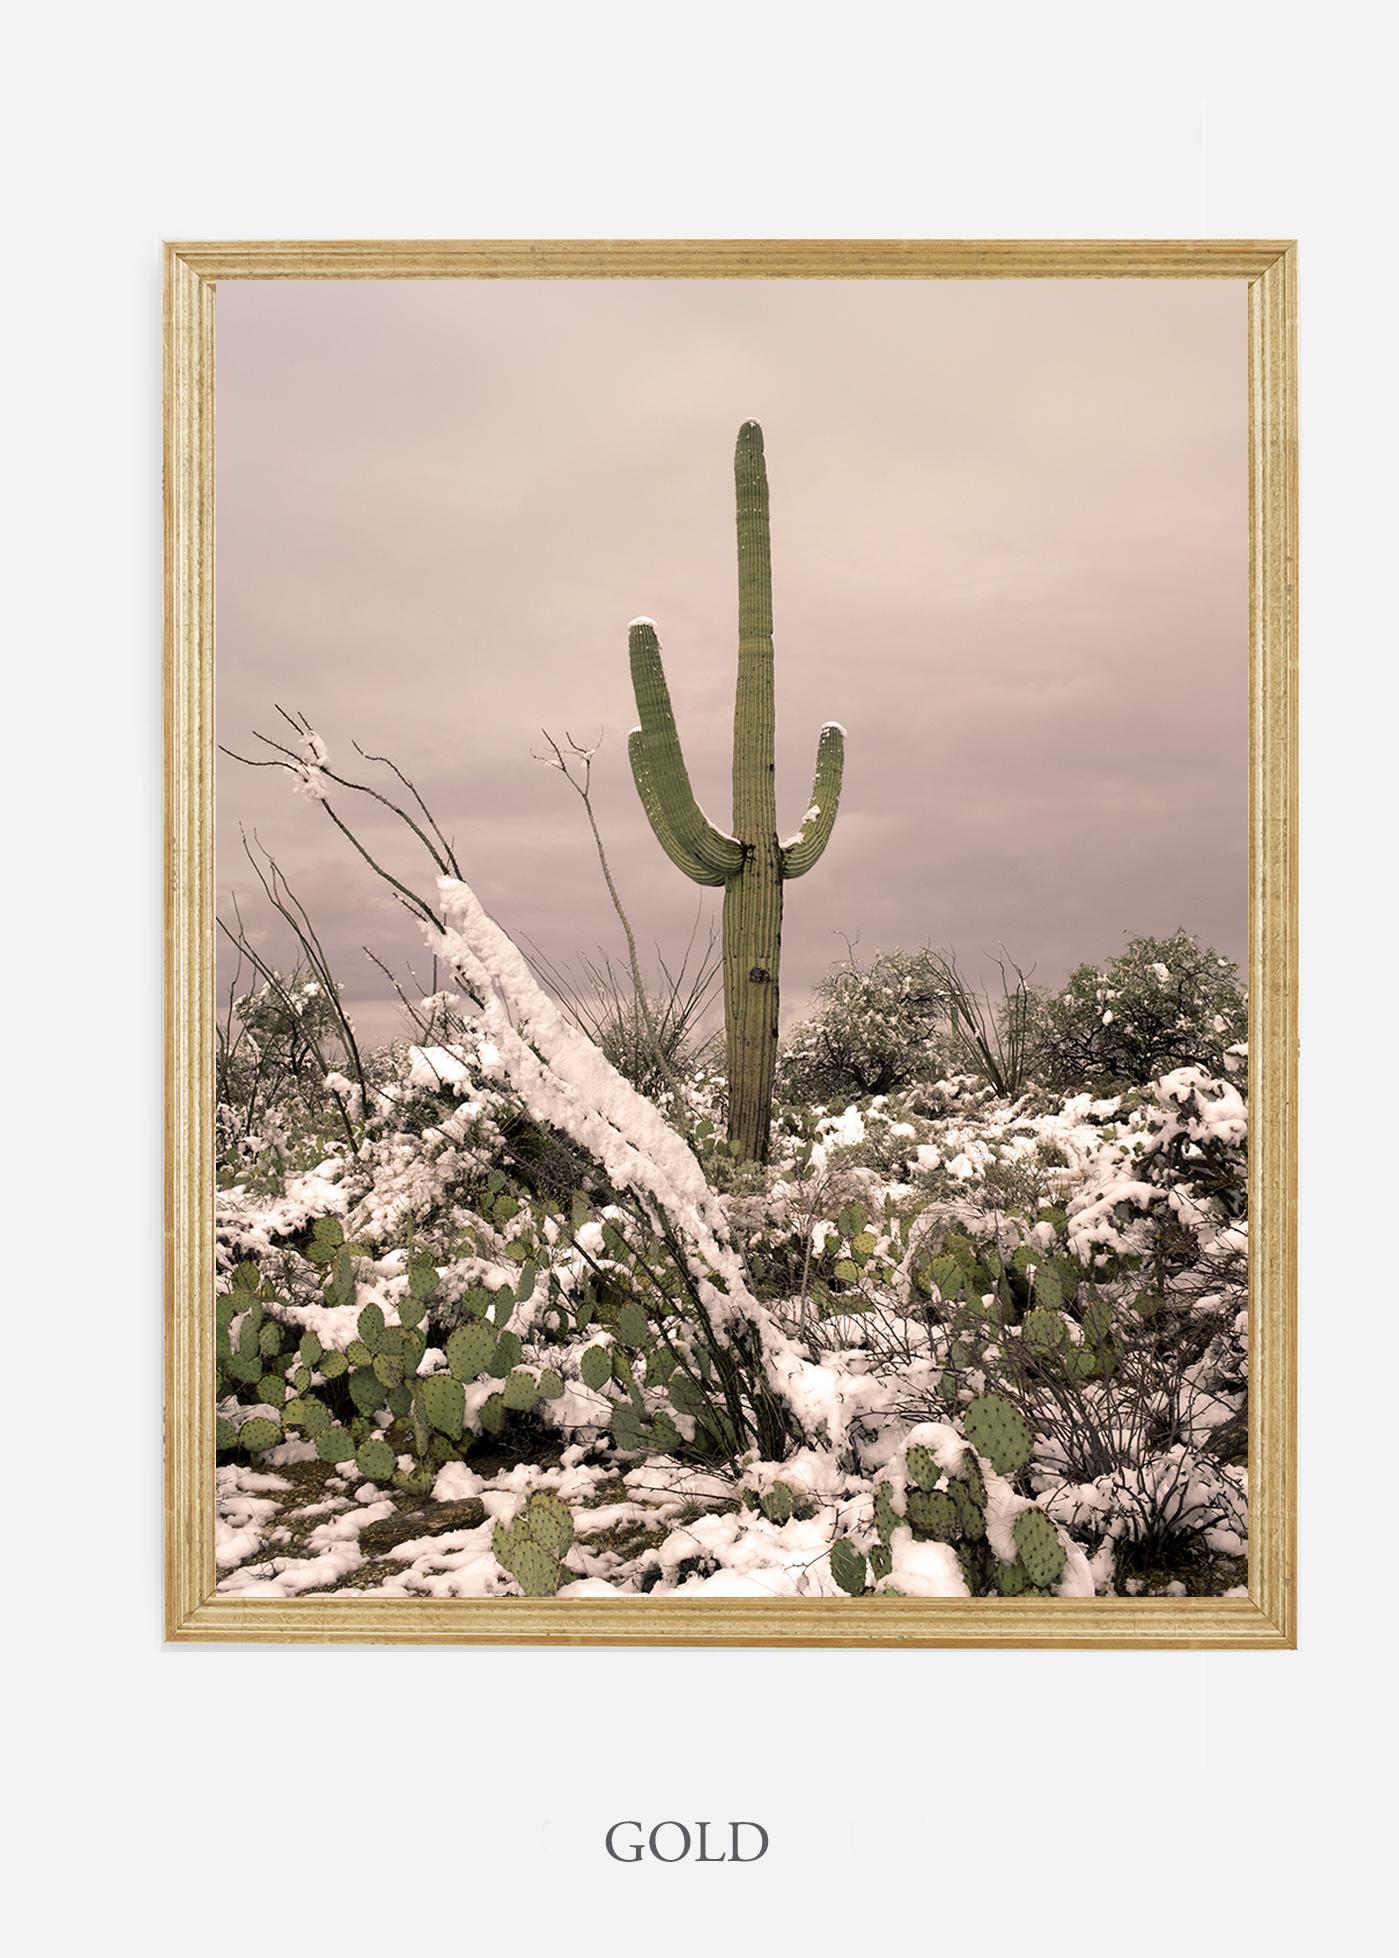 nomat-goldframe-saguaroNo.4-wildercalifornia-art-wallart-cactusprint-homedecor-prints-arizona-botanical-artwork-interiordesign.jpg